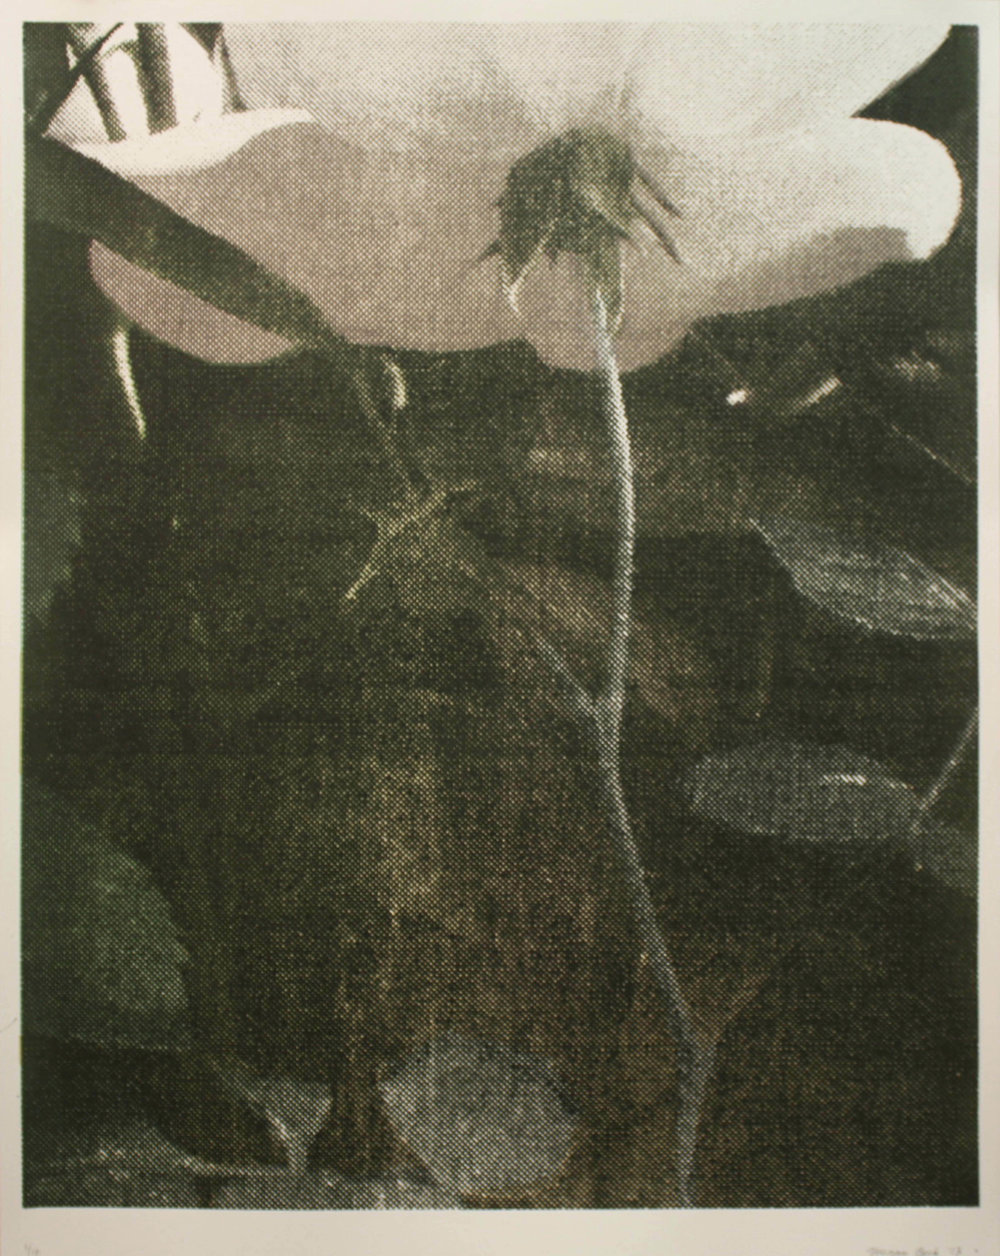 Rose Garden #2, silkscreen, 2013